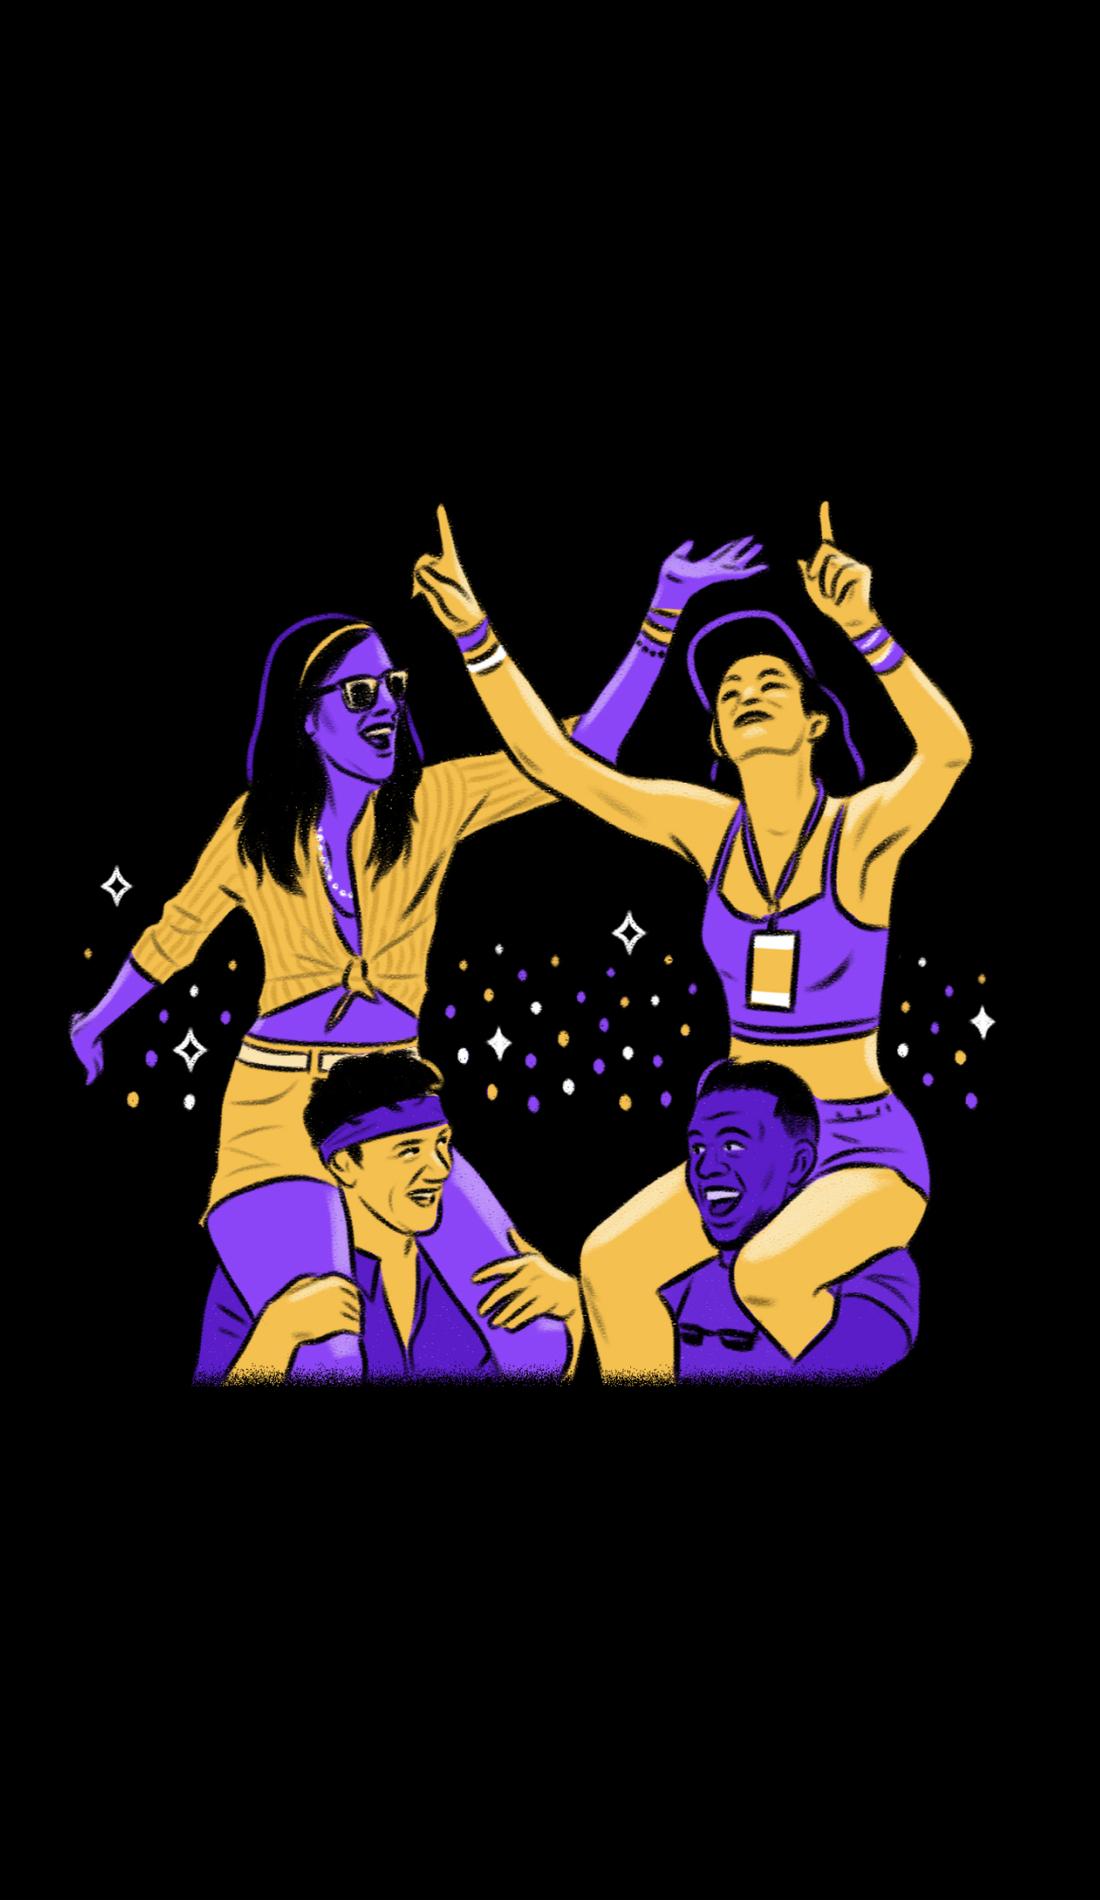 A Beyond Wonderland live event